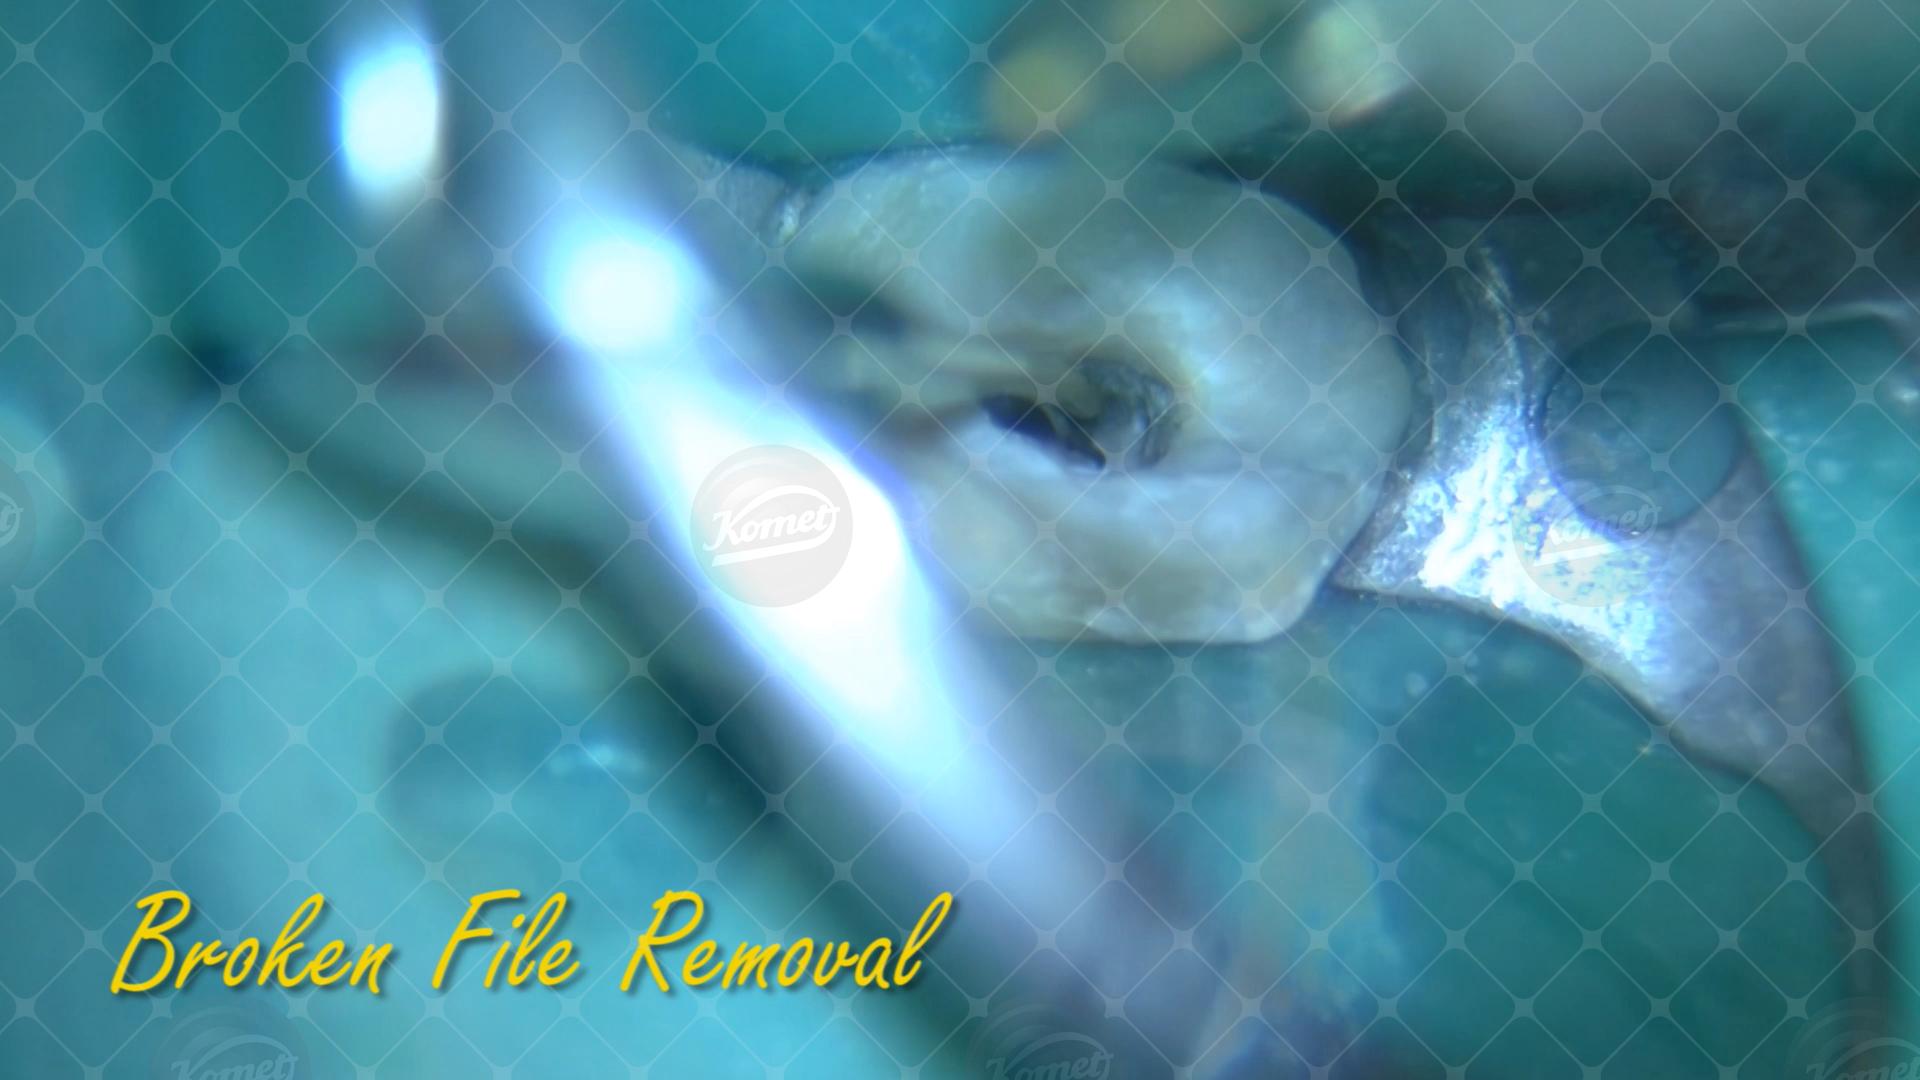 7 Broken file removal Endo & Resto by Alessandro Fava